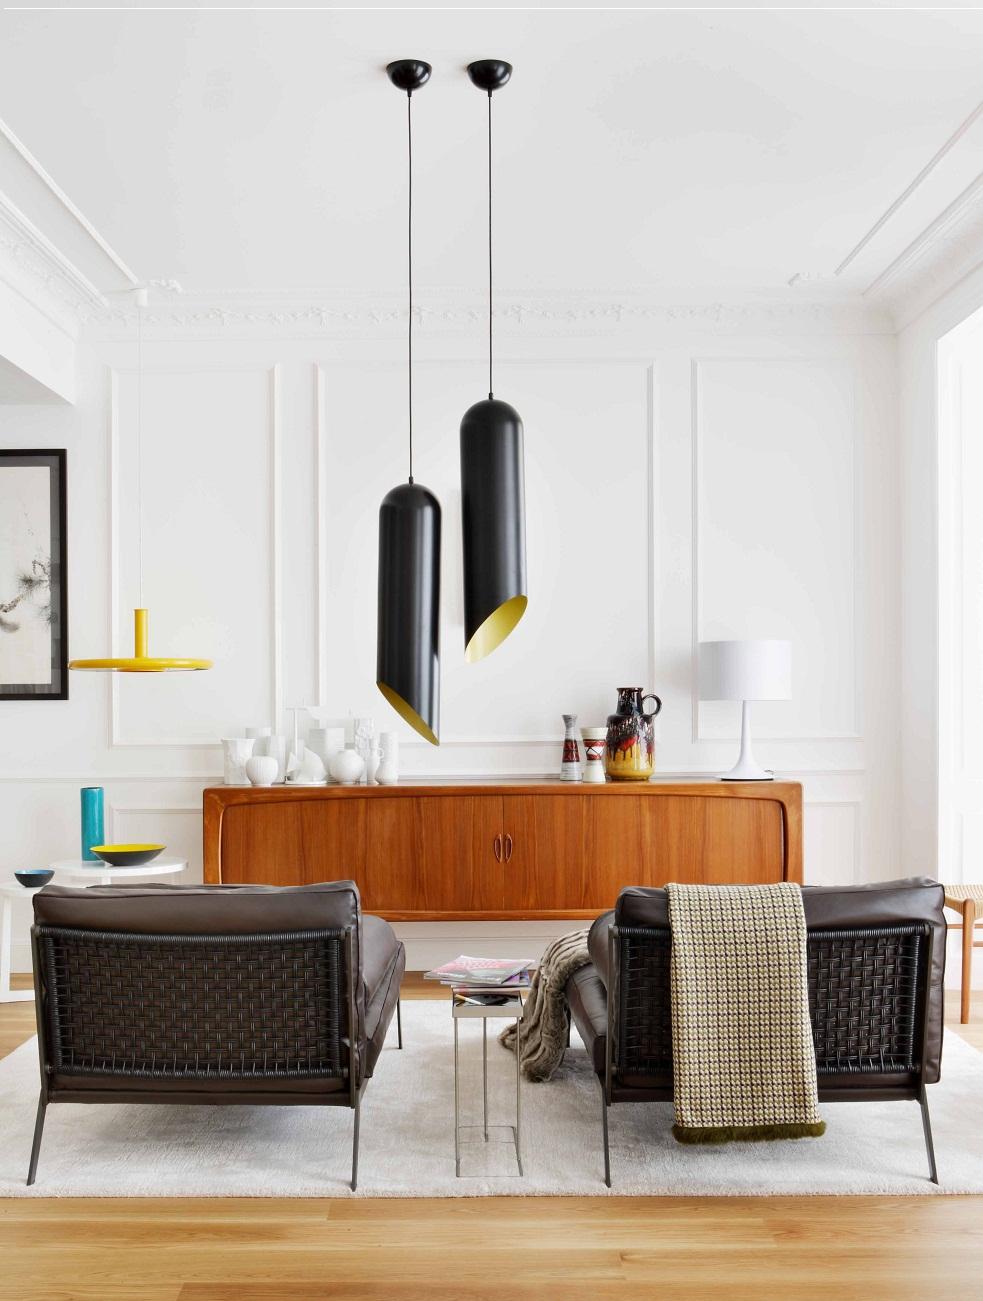 Eclectic San Sebastian apartment of spanish interior designer Mikel Irastorza 7